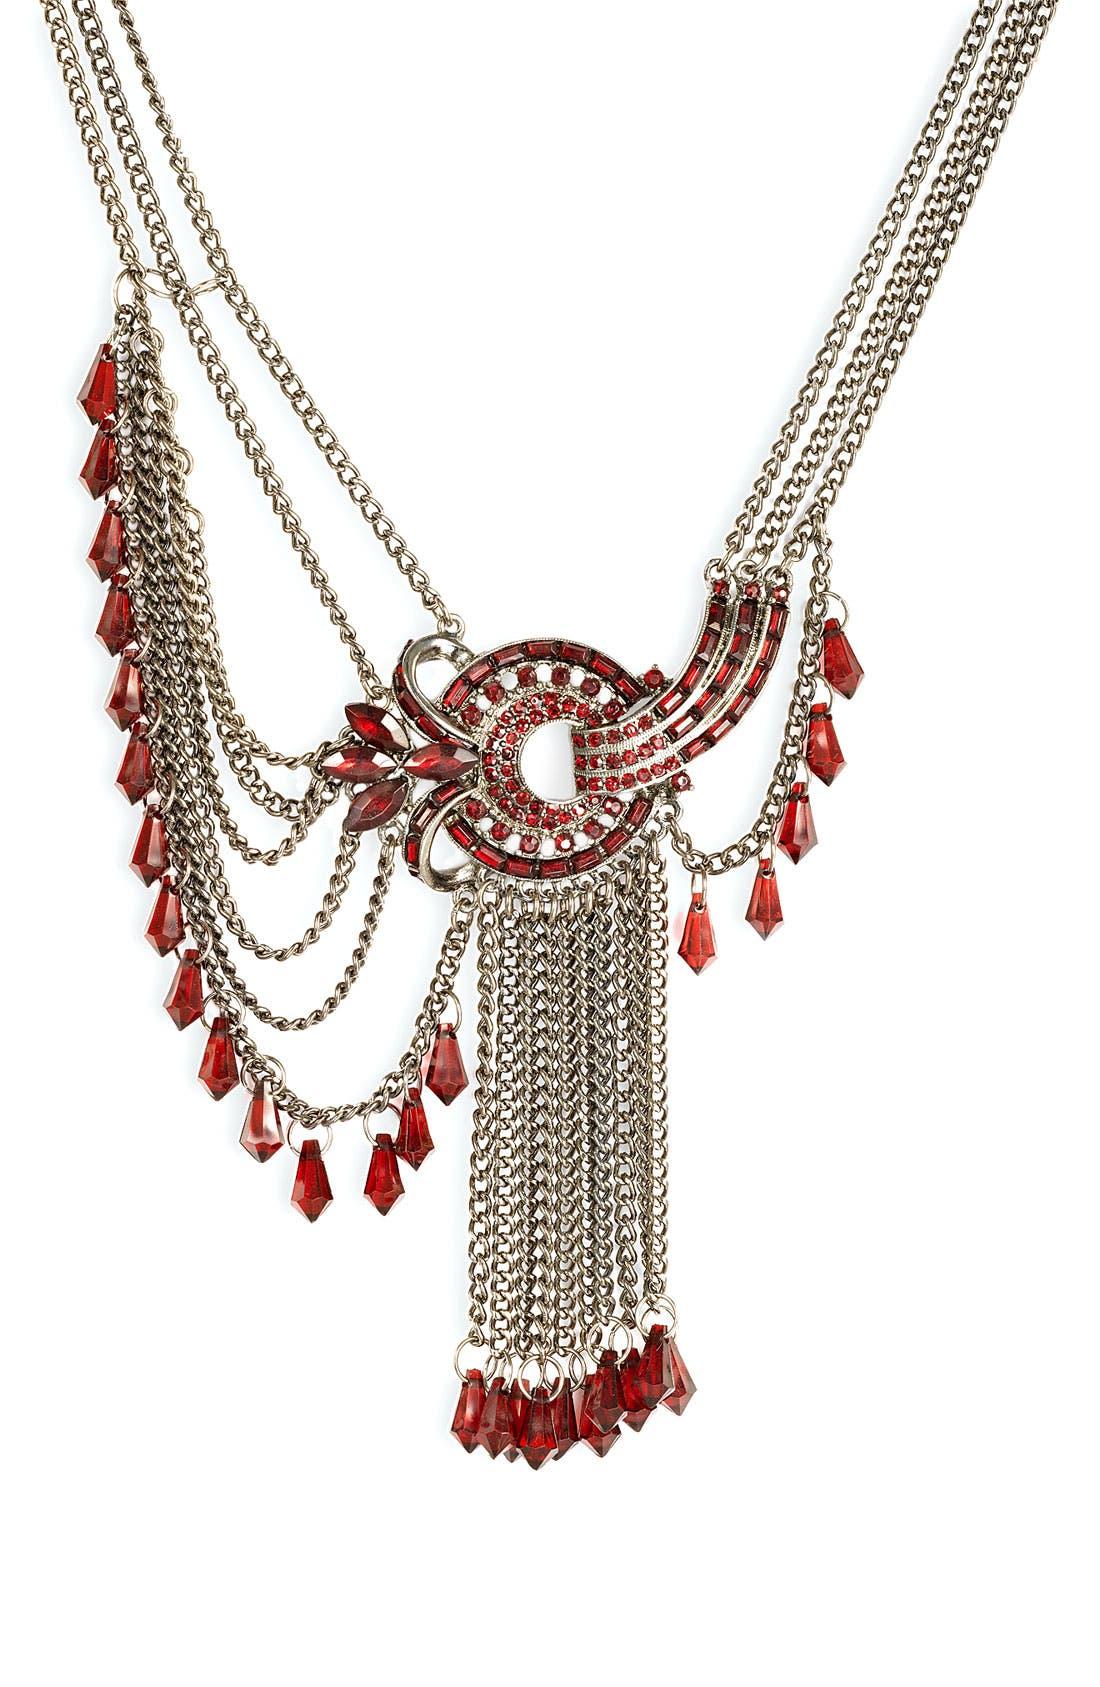 Main Image - Jewelry Fashions Multi Chain Statement Necklace